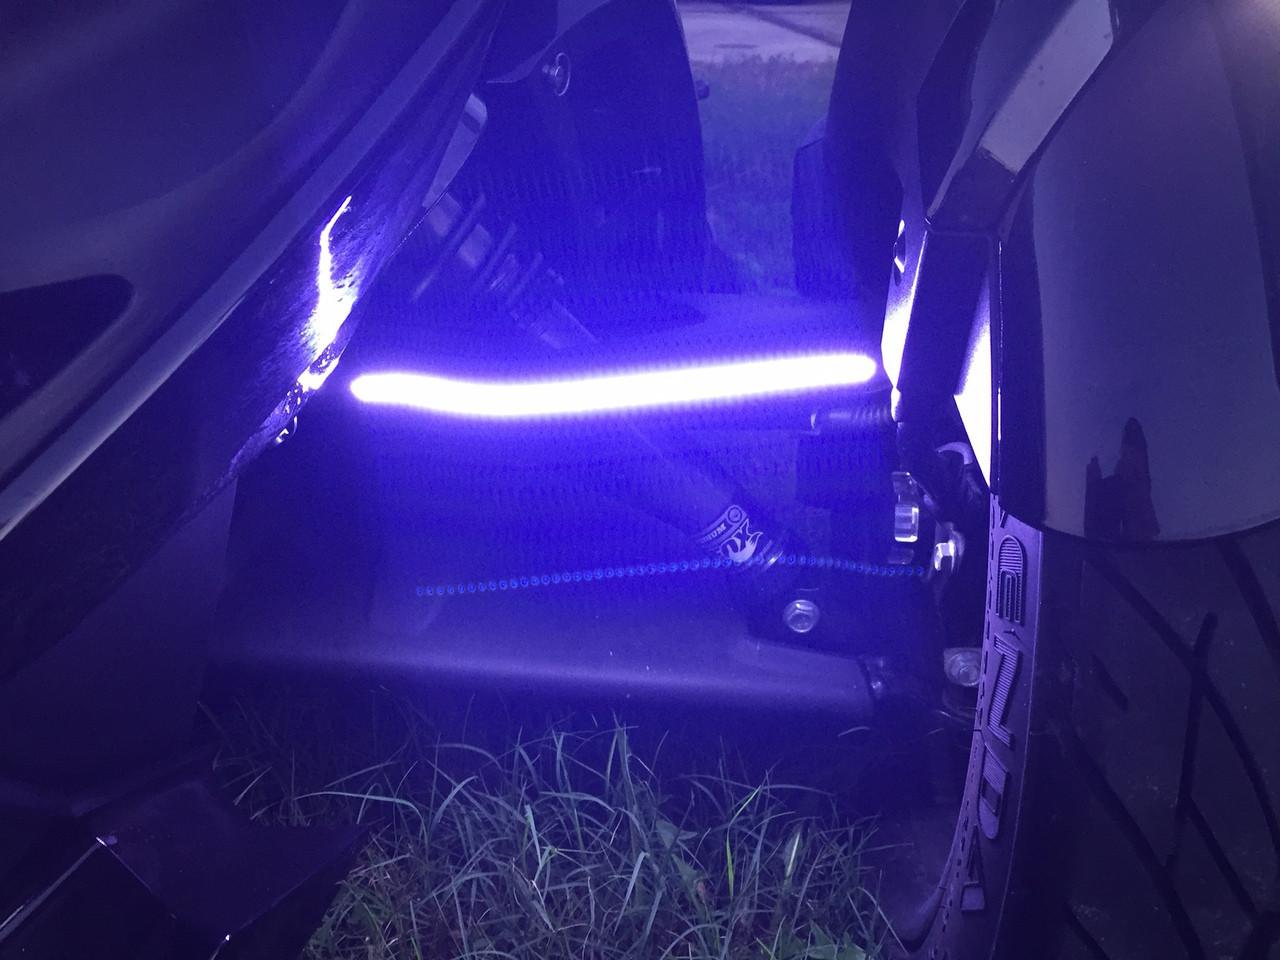 Can-Am Spyder Daytime Running Lights